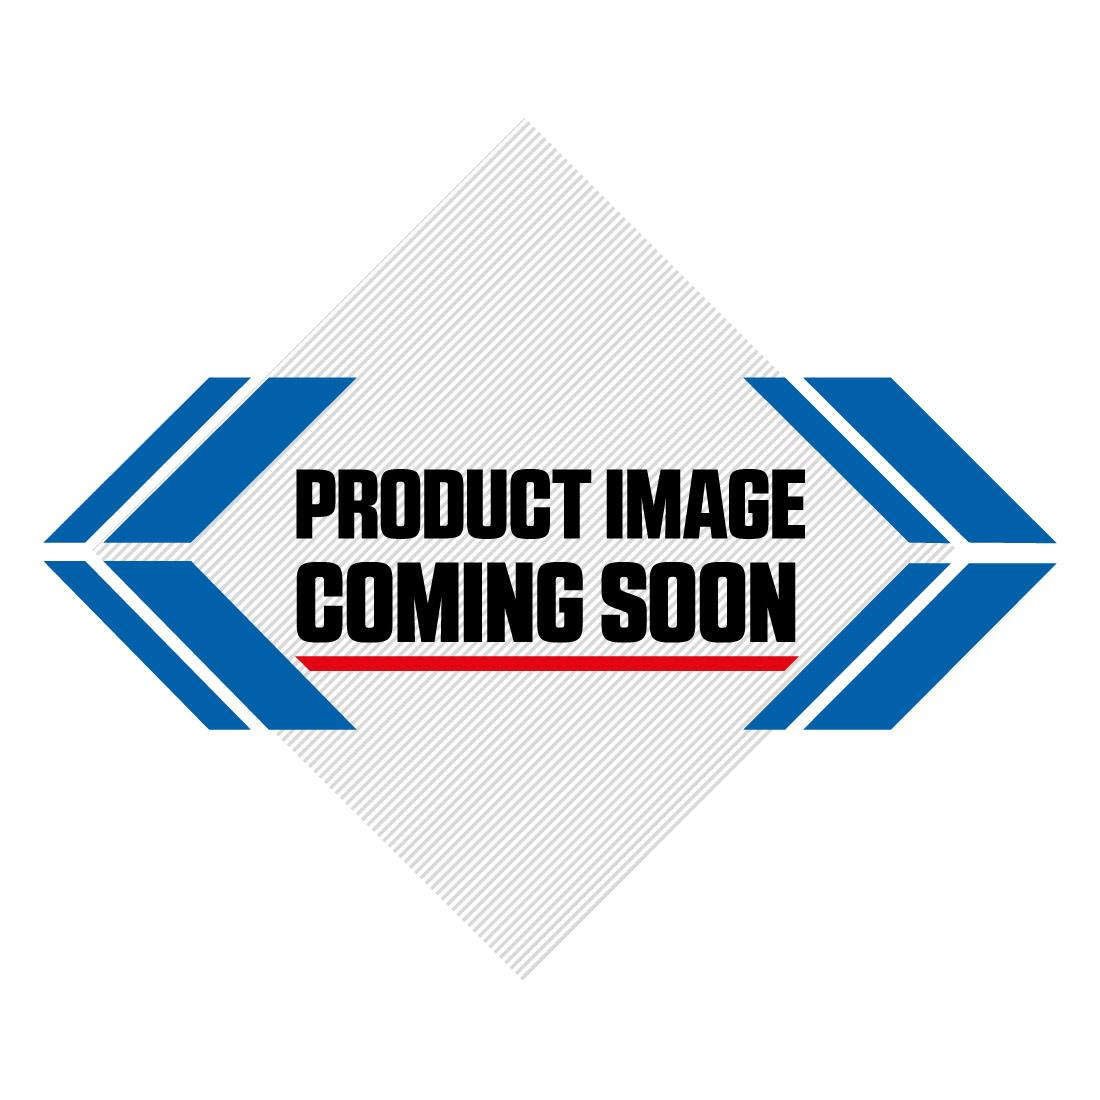 Suzuki Restyled Plastic Kit Suzuki RM 85 (00-17) Black Image-0